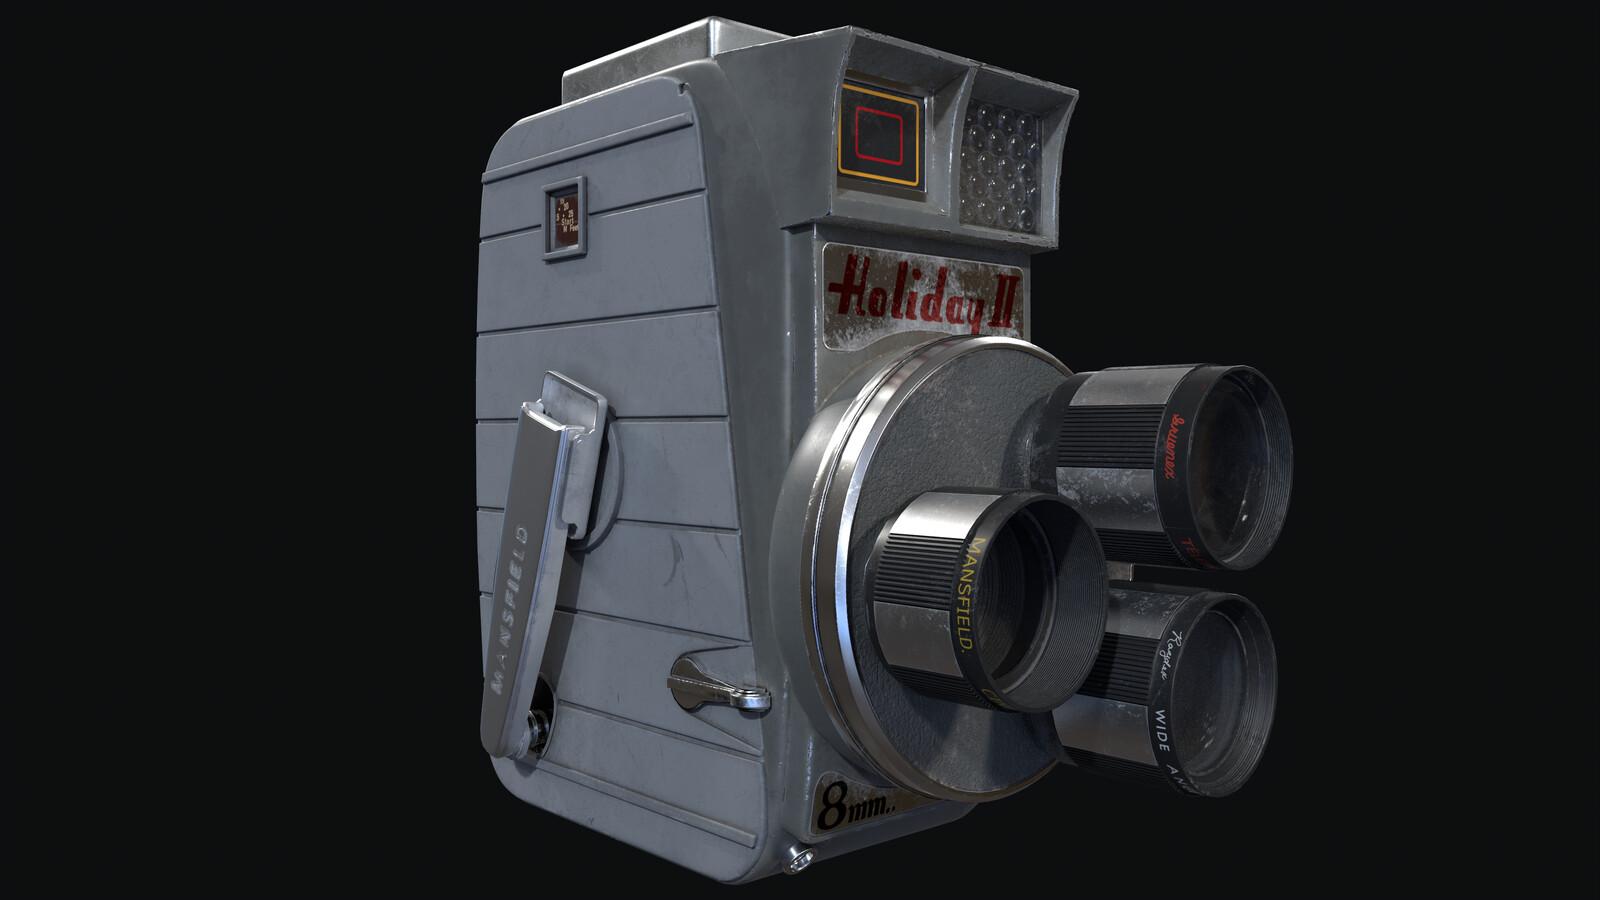 Mansfield Holiday II 8mm Triple Turret Camera